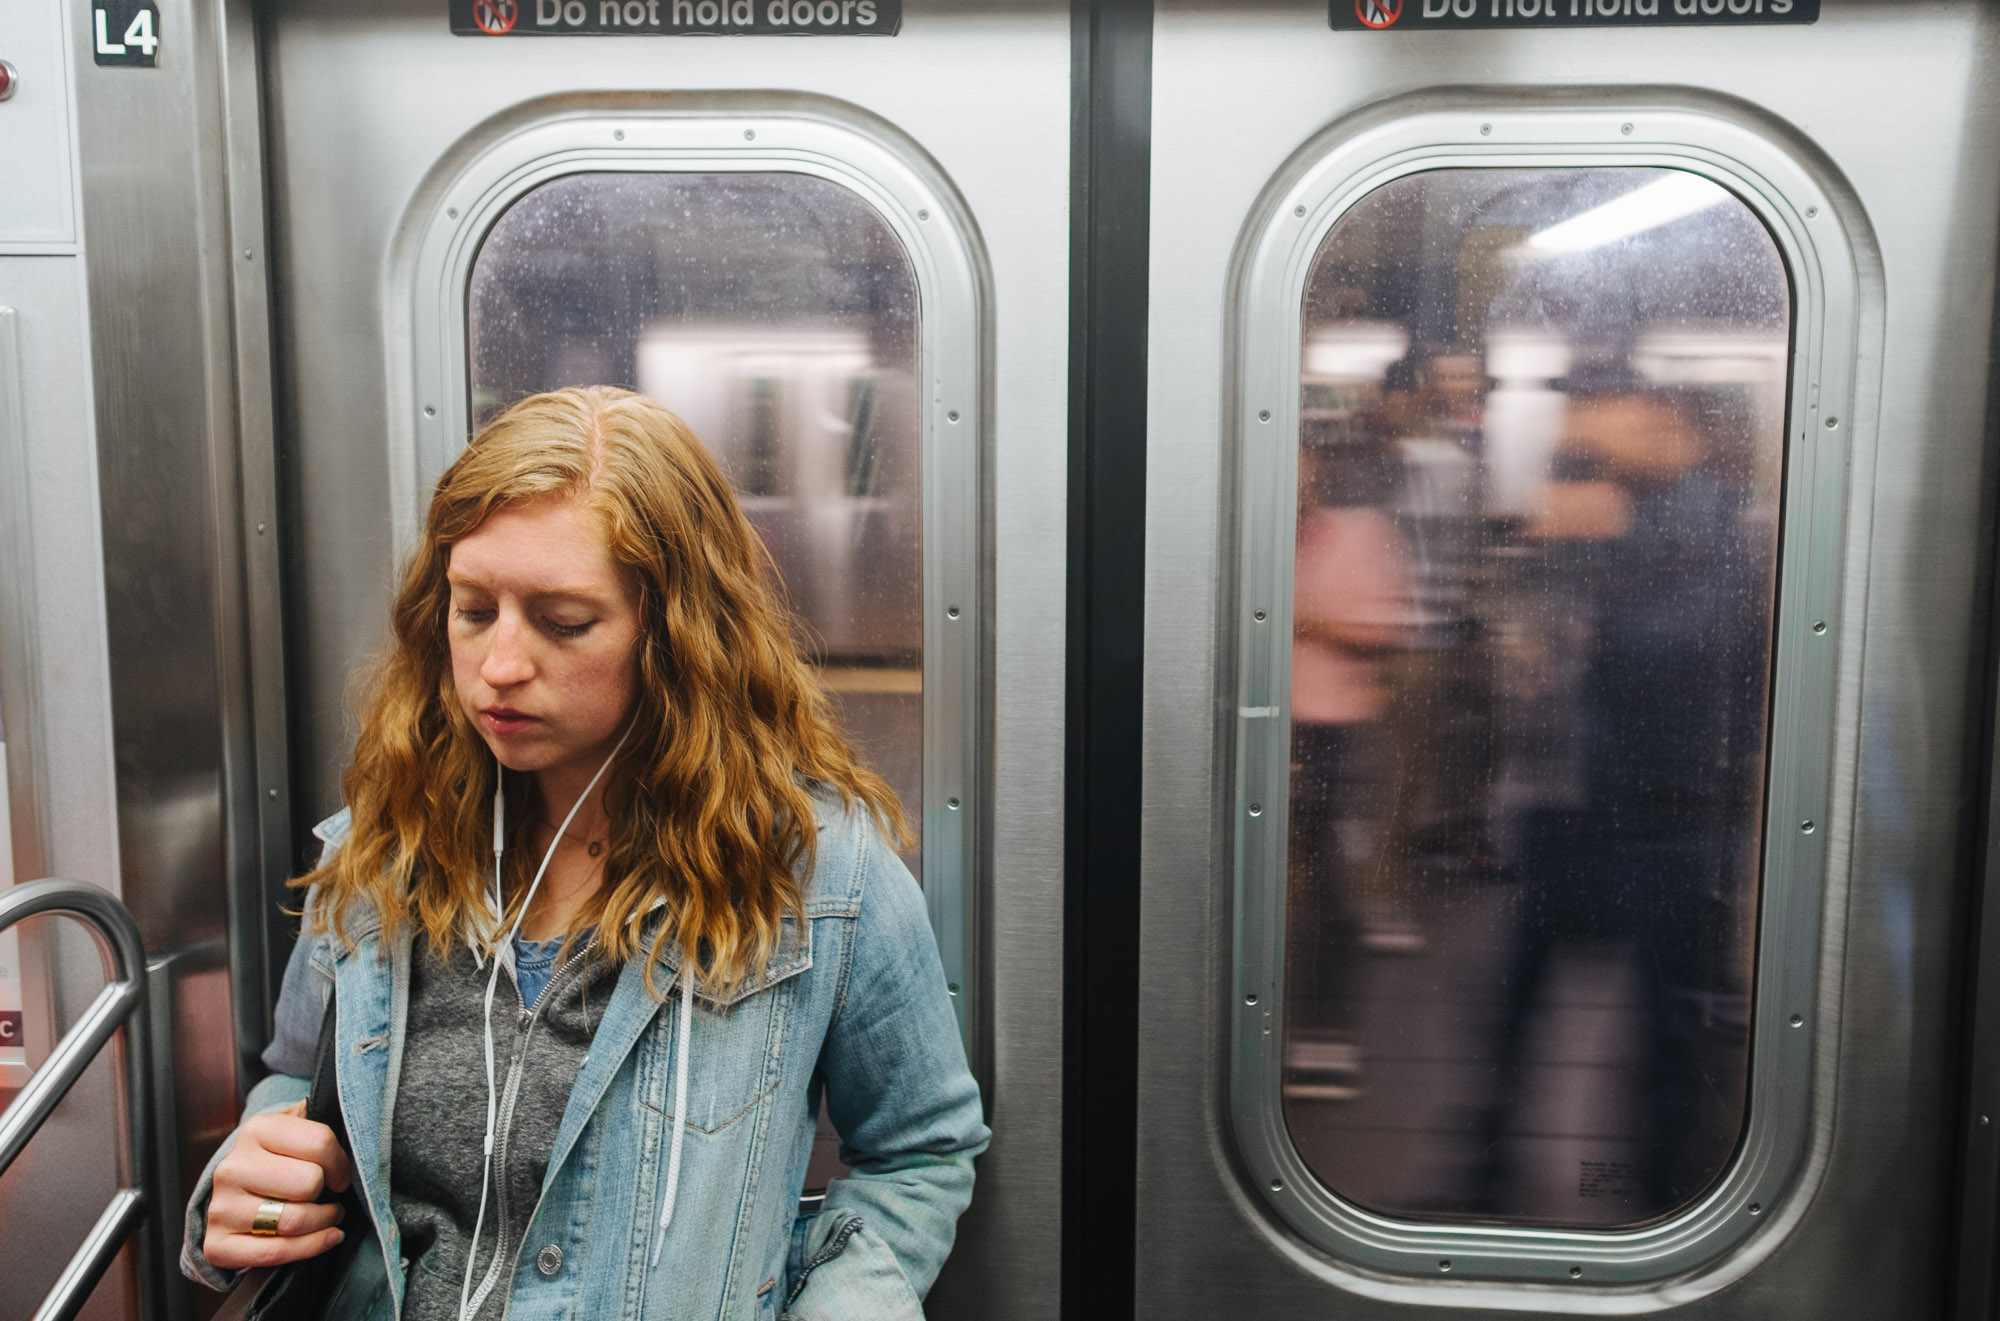 A girl on the train at Fulton Street, Manhattan. Fuji X-pro1, Rokinon 12mm f/2.